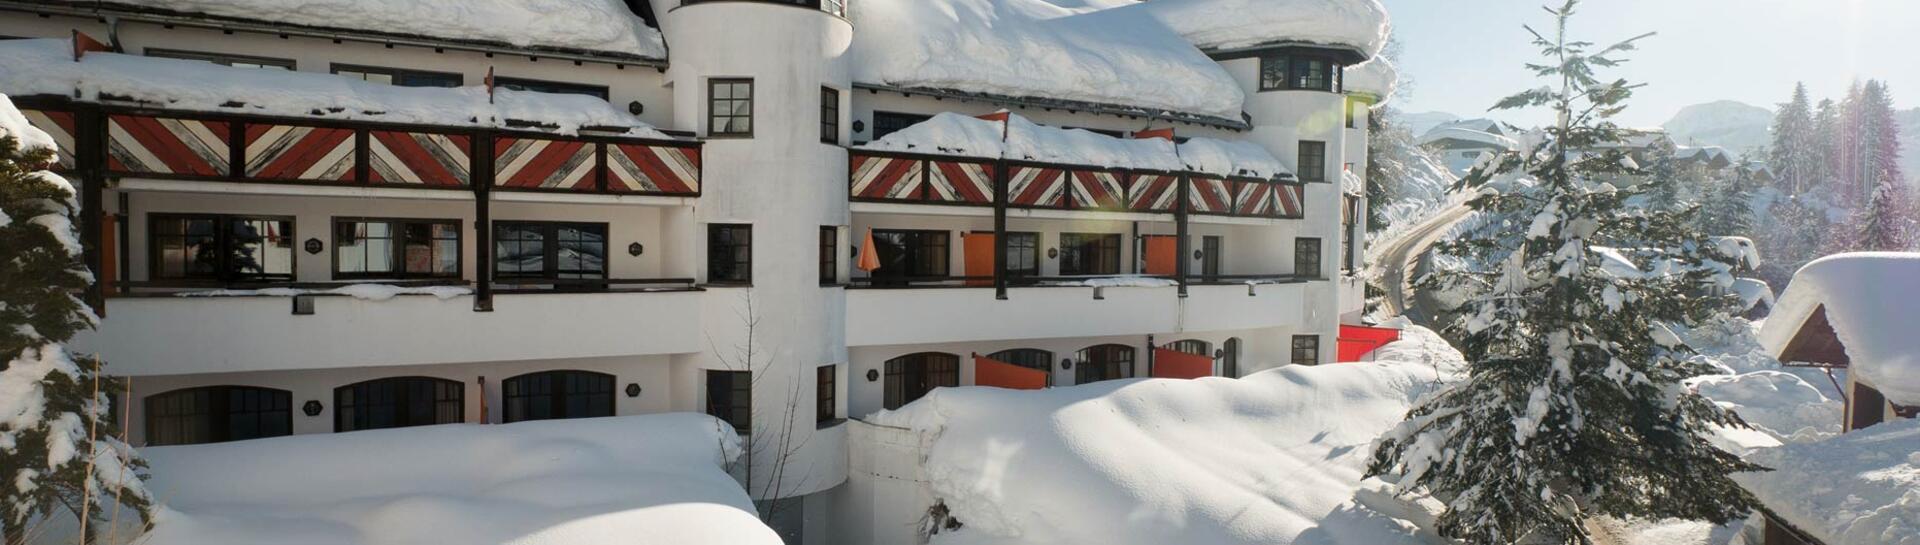 schlosshotel-rosenegg de associated-resort 003